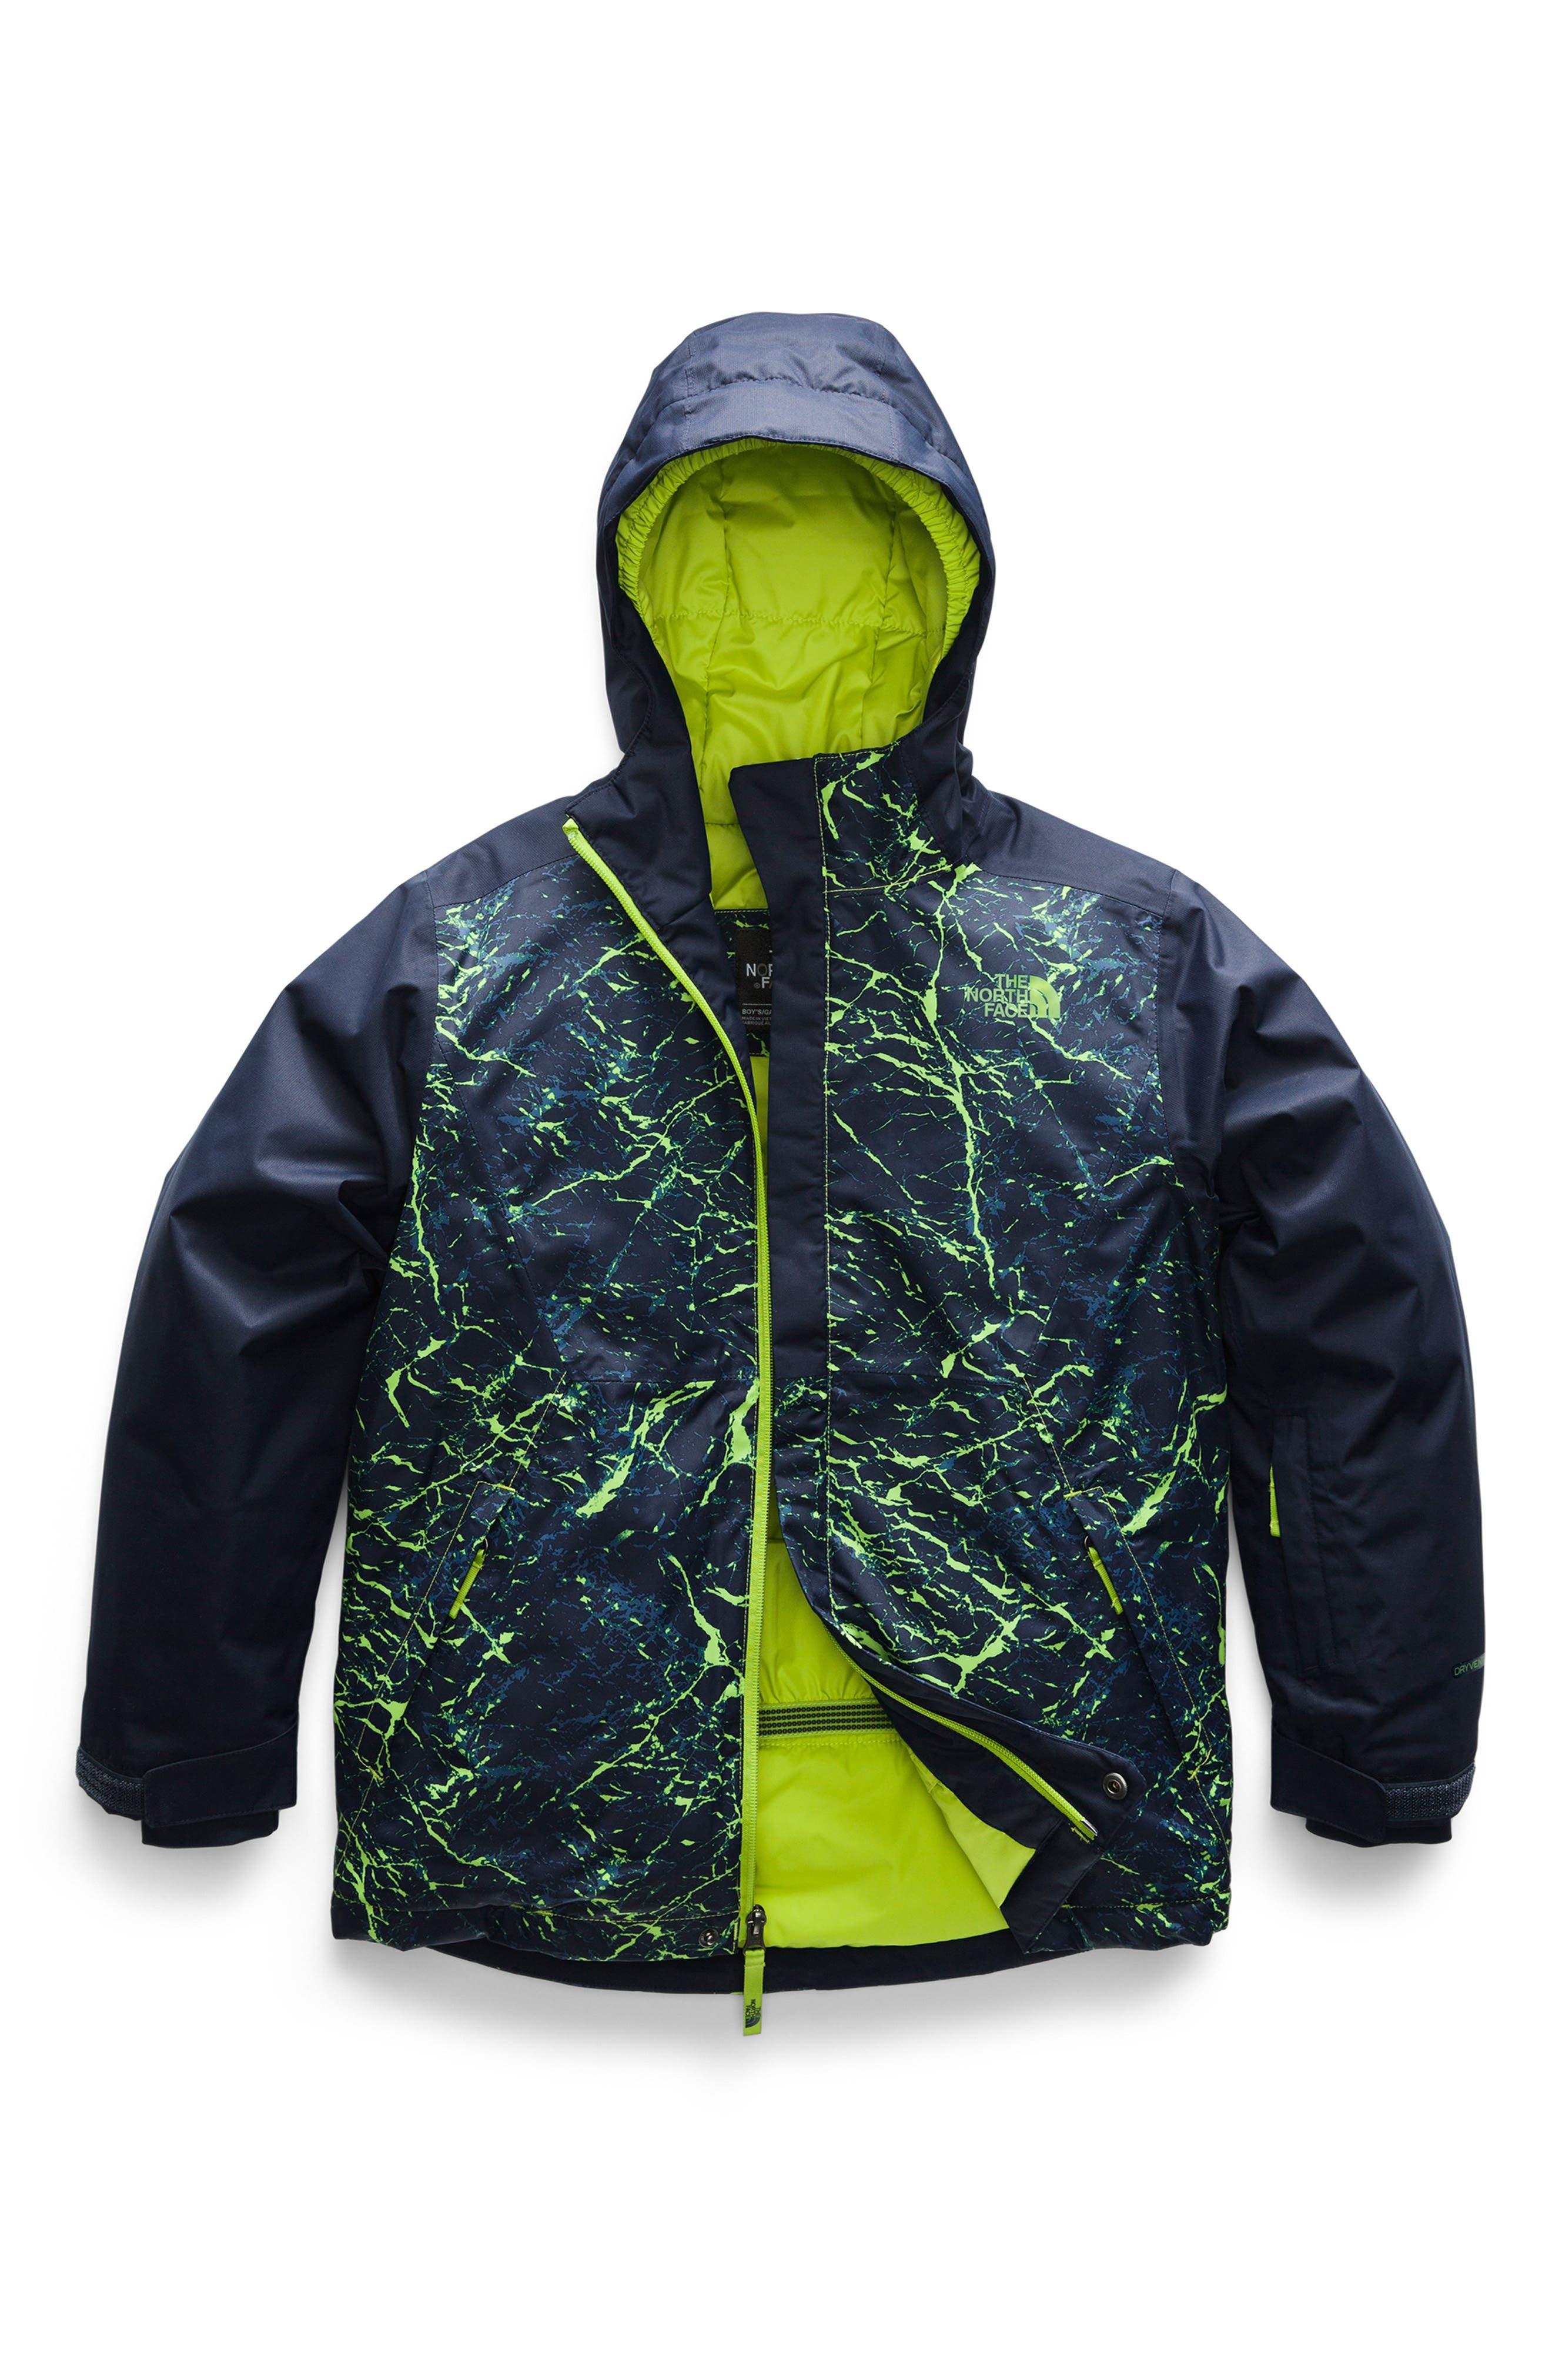 Boys The North Face Brayden Waterproof  Windproof Heatseeker(TM) Insulated Snowsports Jacket Size L (1416)  Green